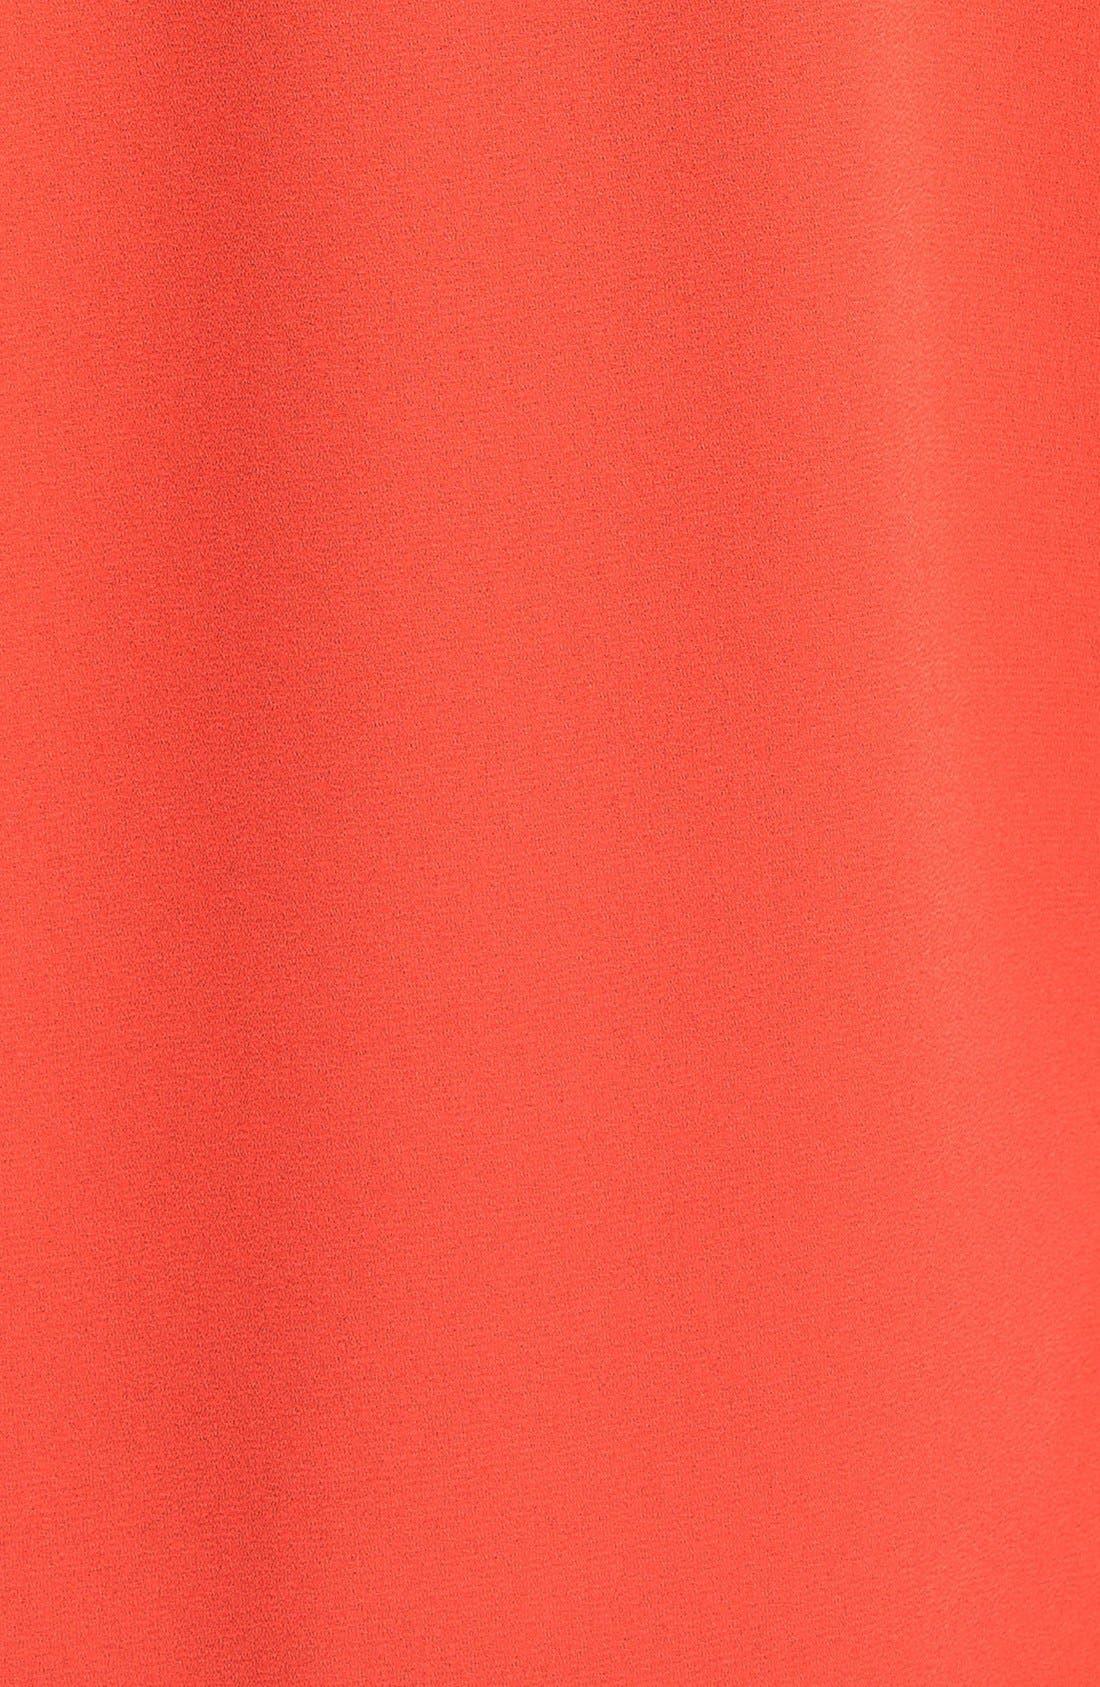 Cuff Sleeve Woven Tee,                             Alternate thumbnail 107, color,